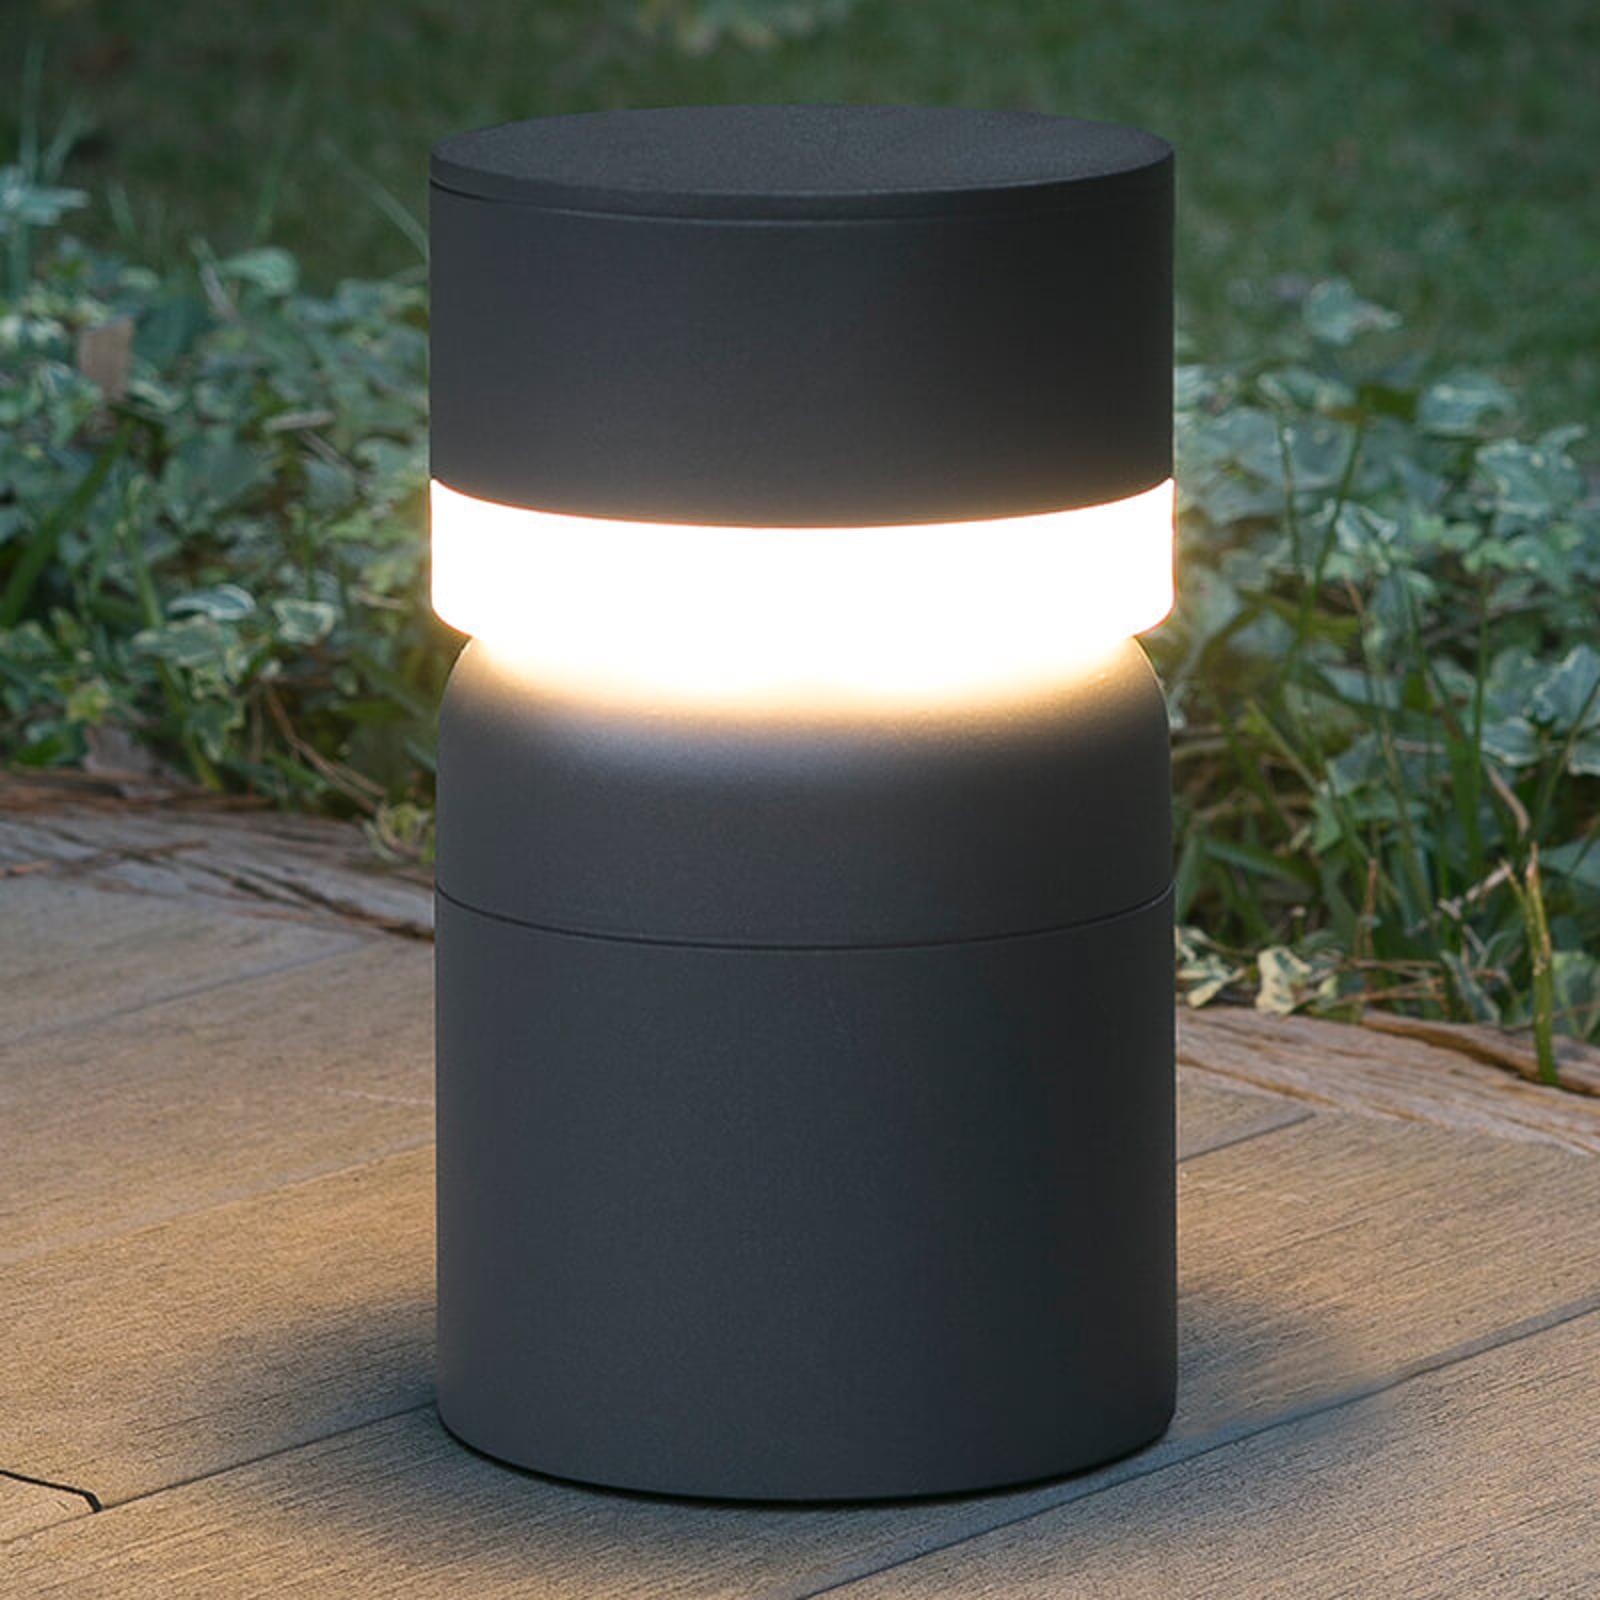 LED-Sockelleuchte Sete, dunkelgrau